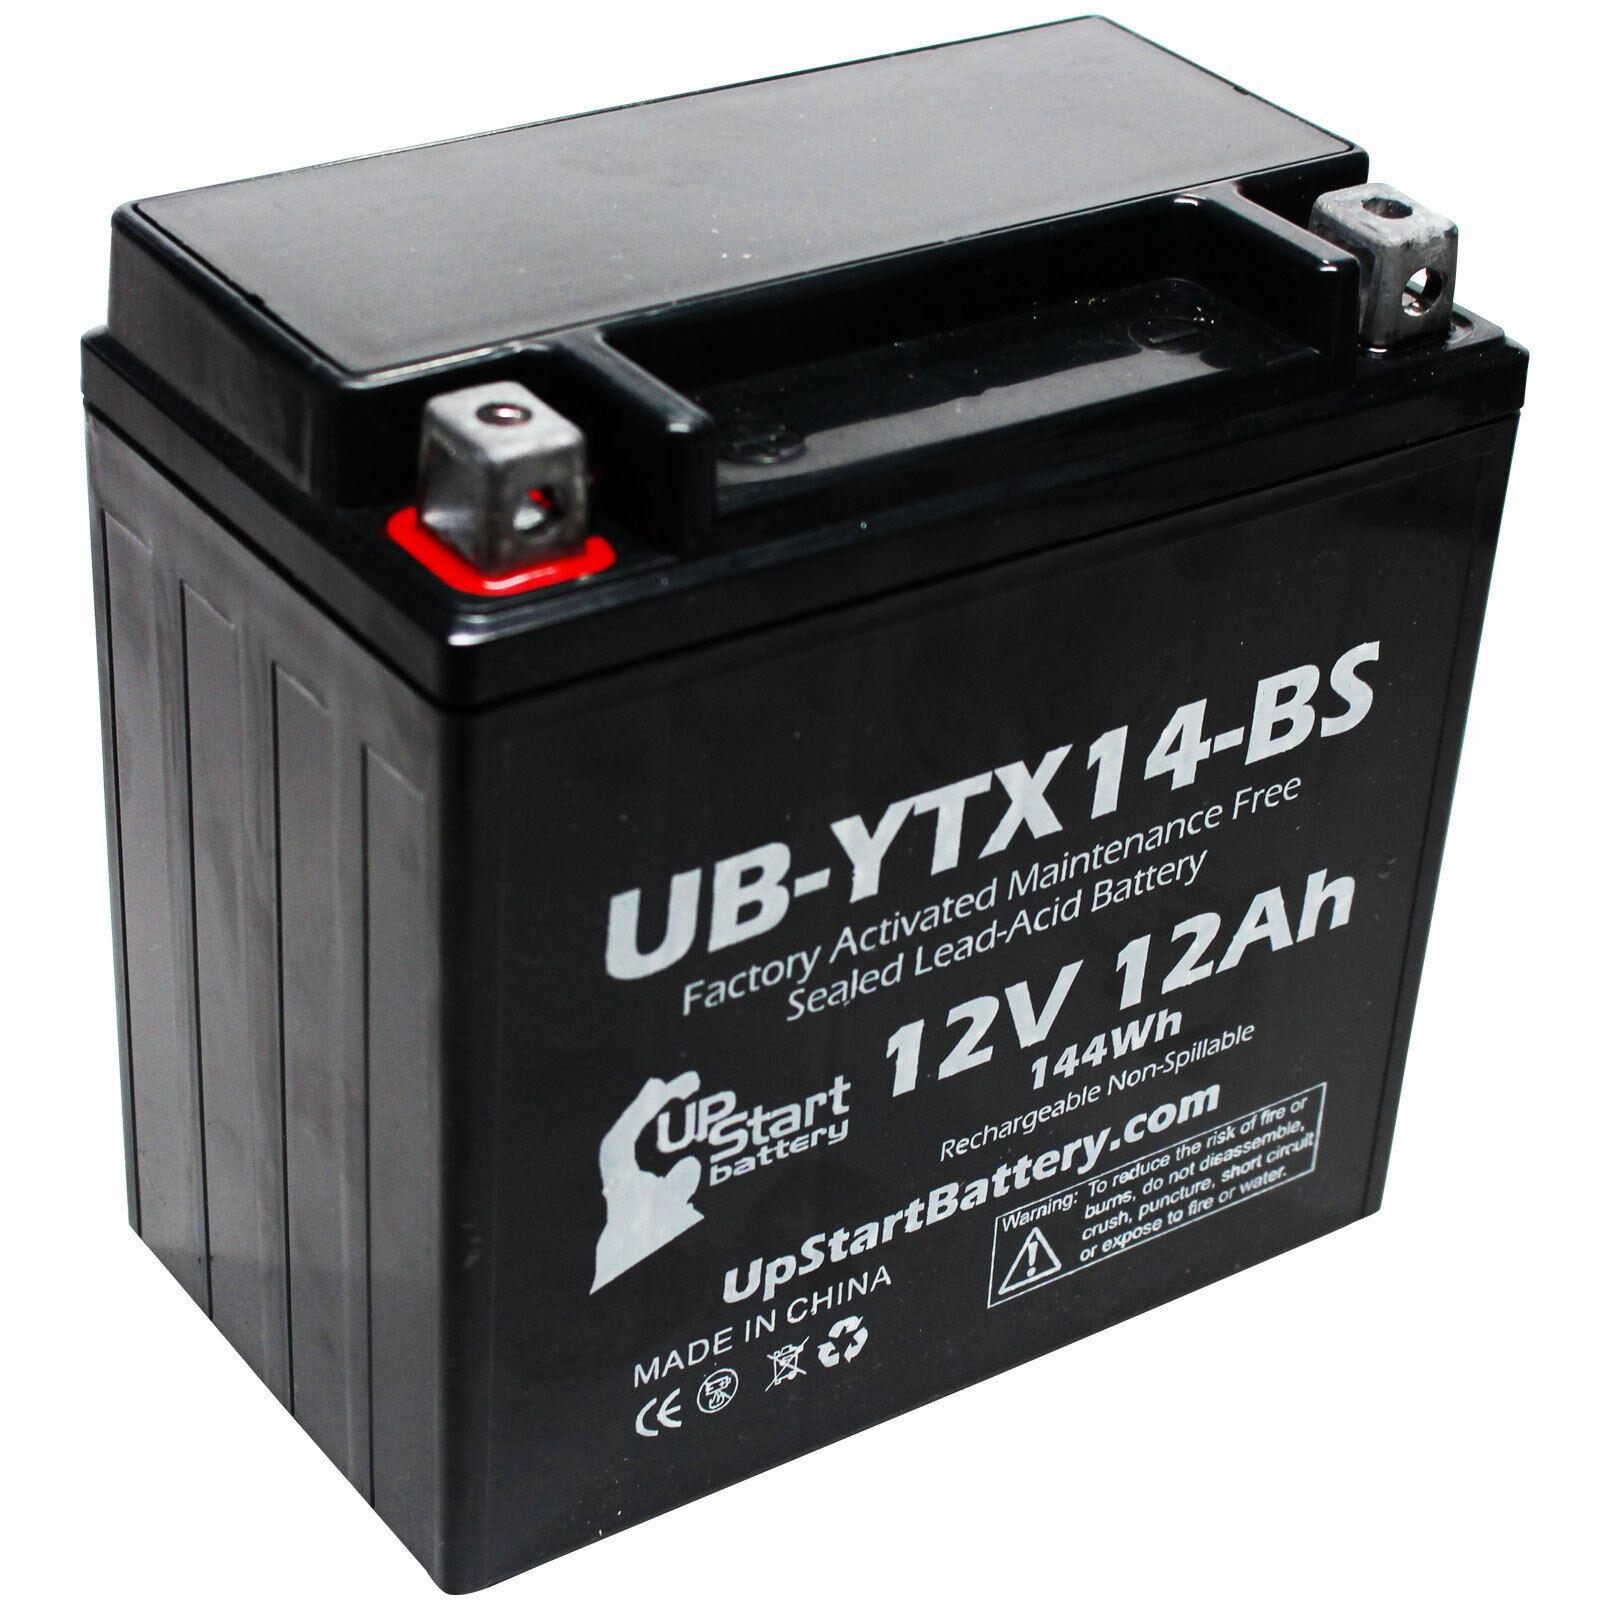 12V 12AH Battery for 1999 Honda GL1500 Valkyrie 1500 CC